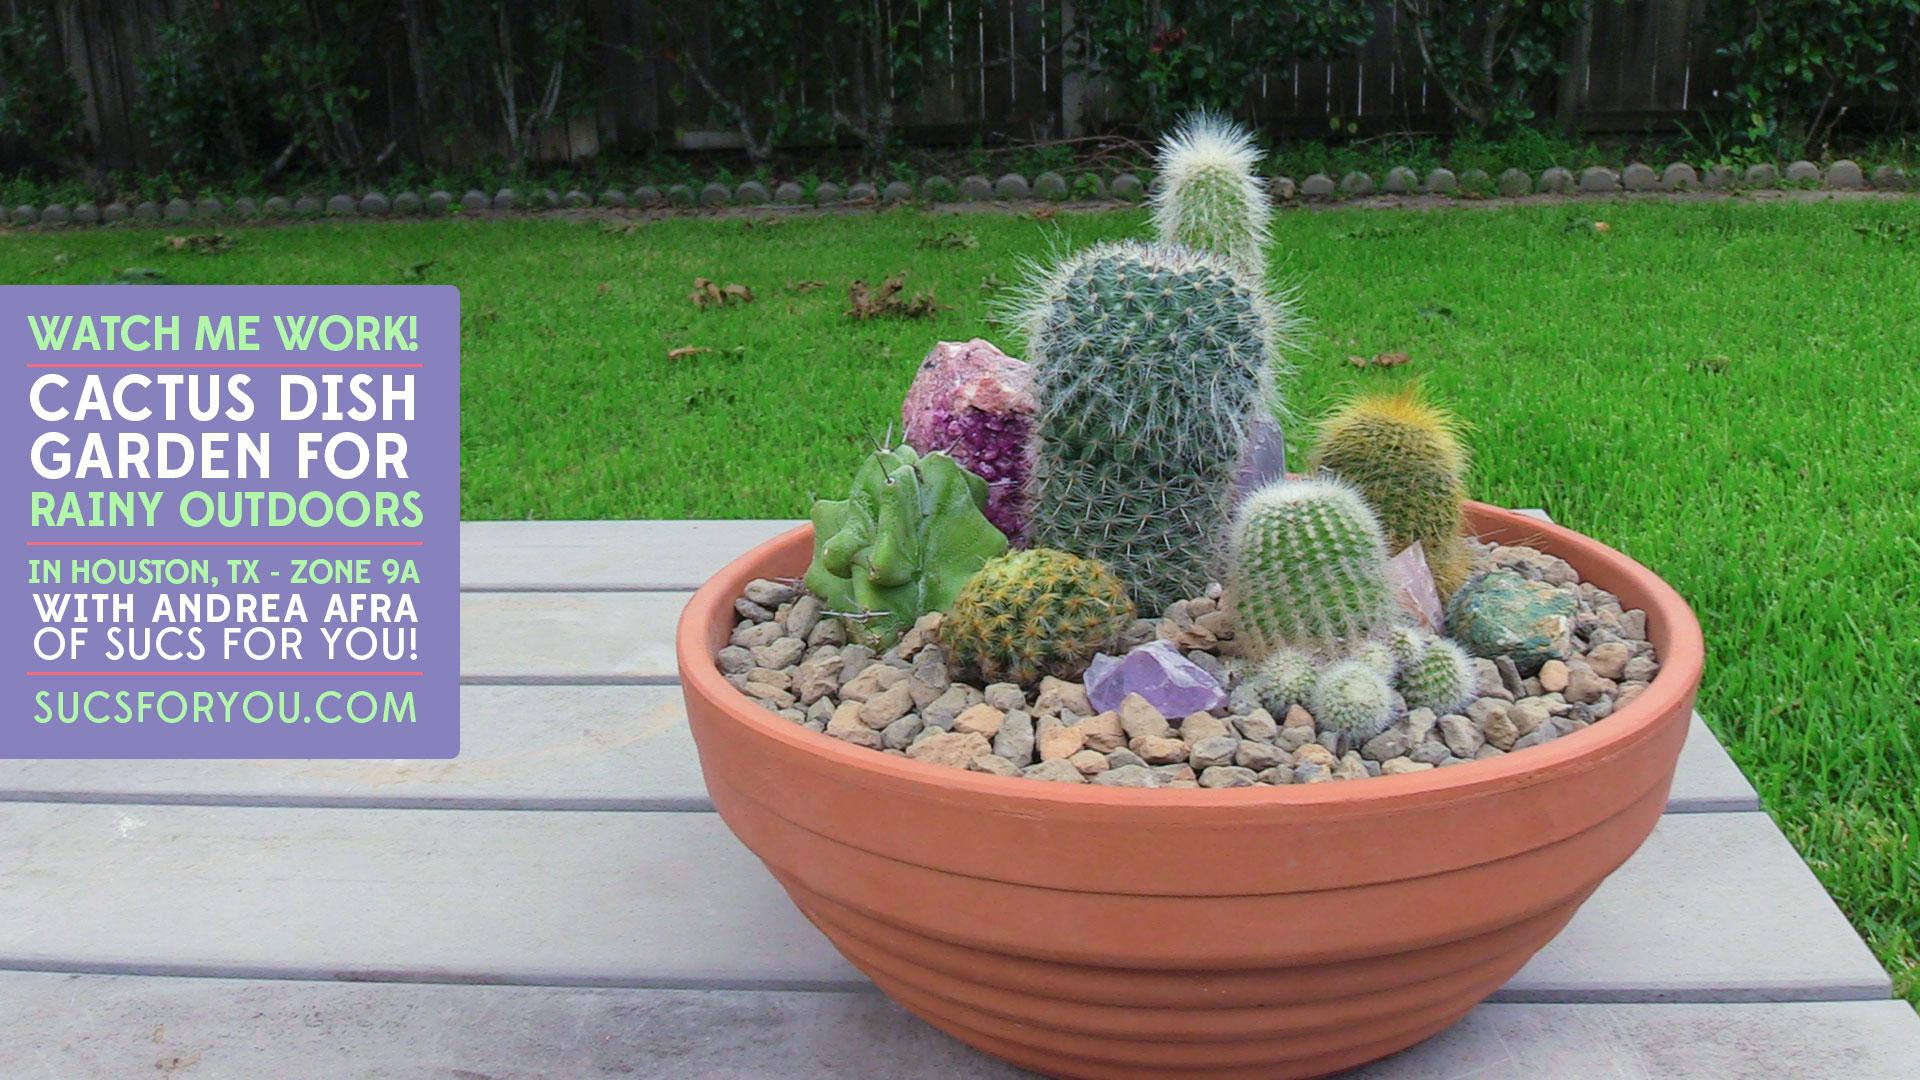 Cactus dish garden for rainy outdoors